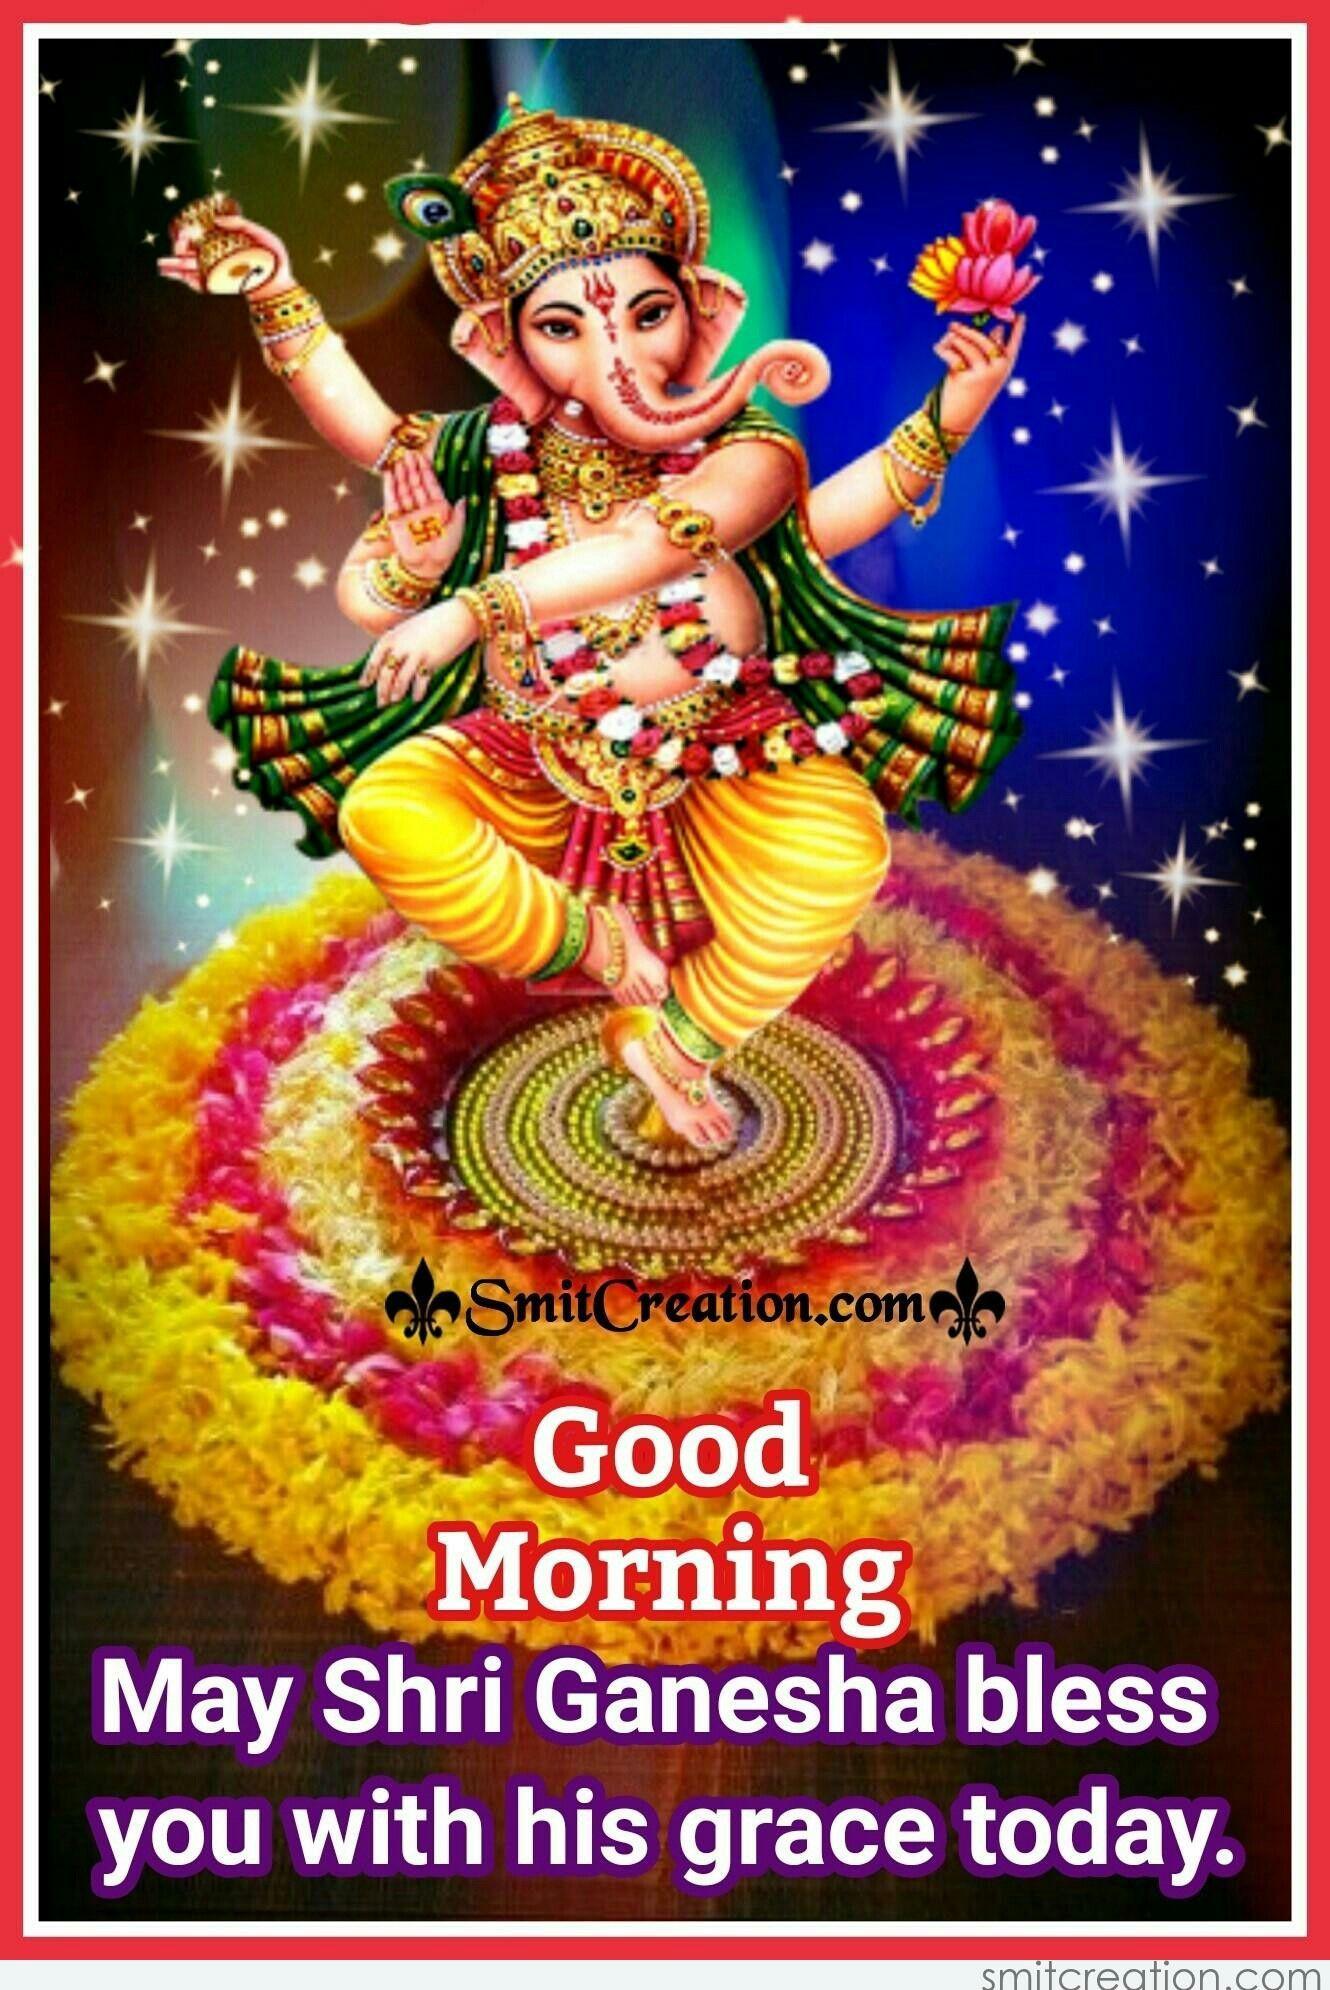 Pin By Bhaskar On Gif Morning Images Shree Ganesh Shri Ganesh